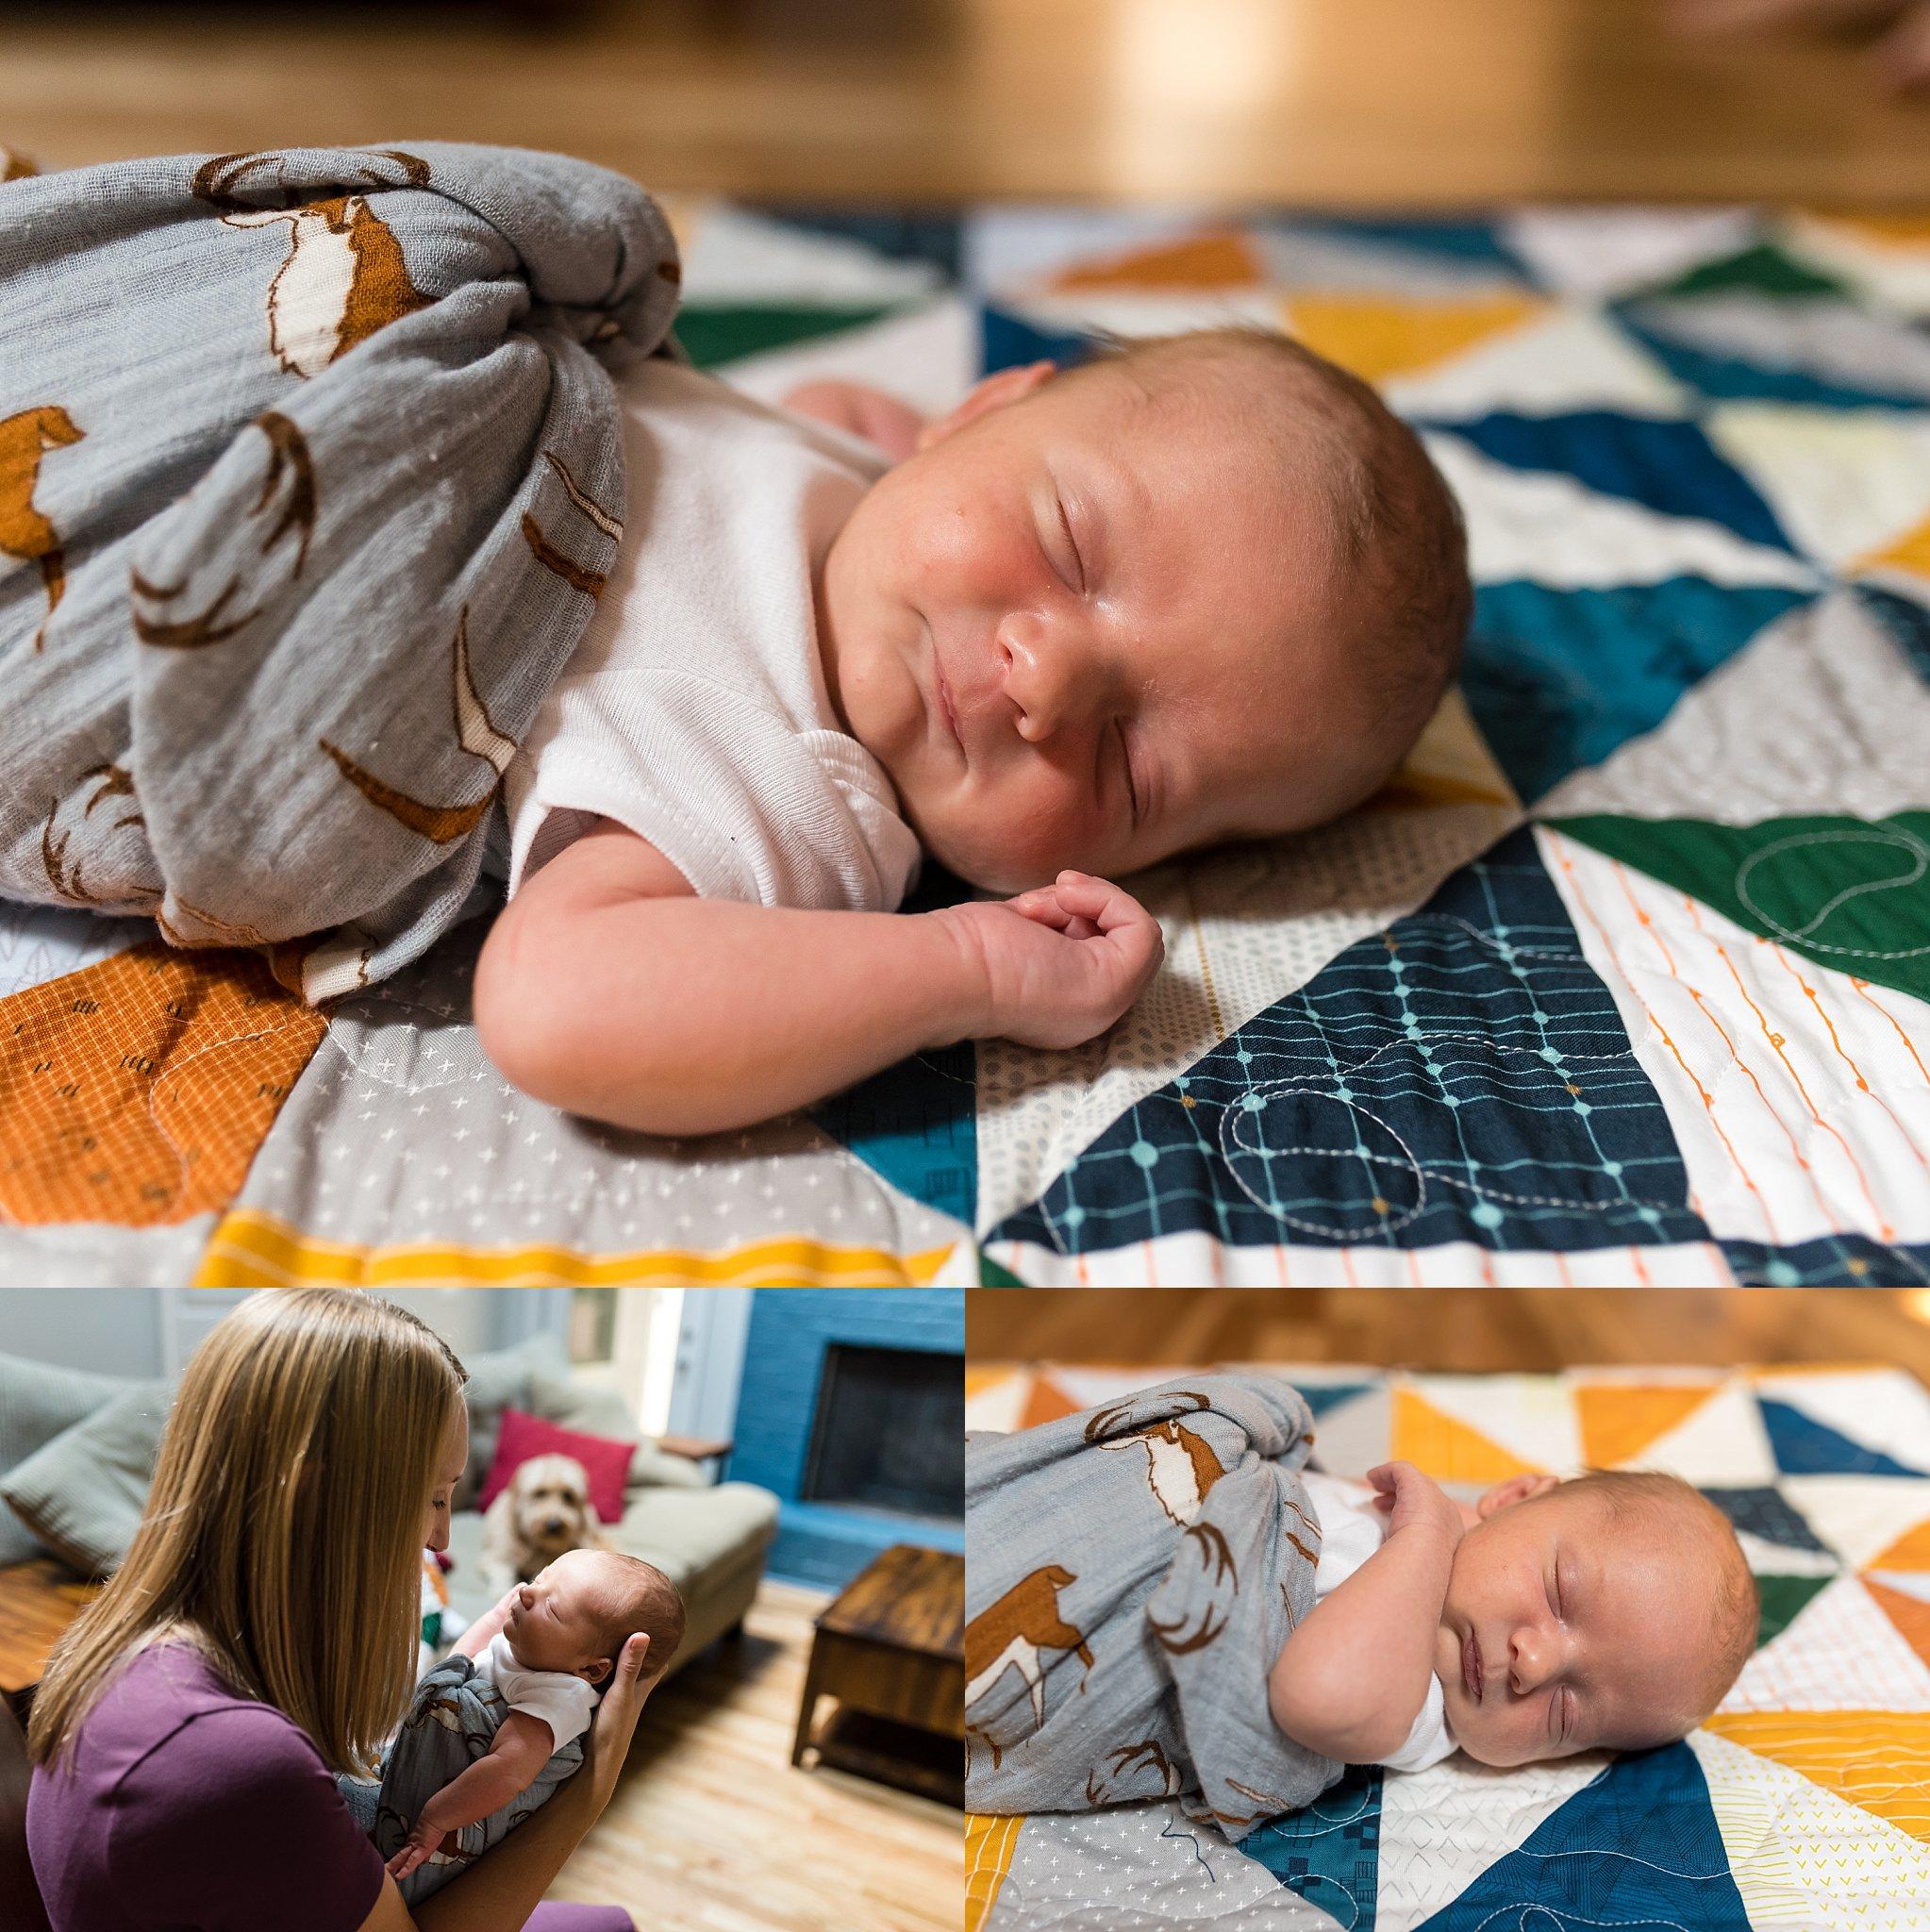 atlanta-family-photographers-decatur-newborn-photography (13).jpg